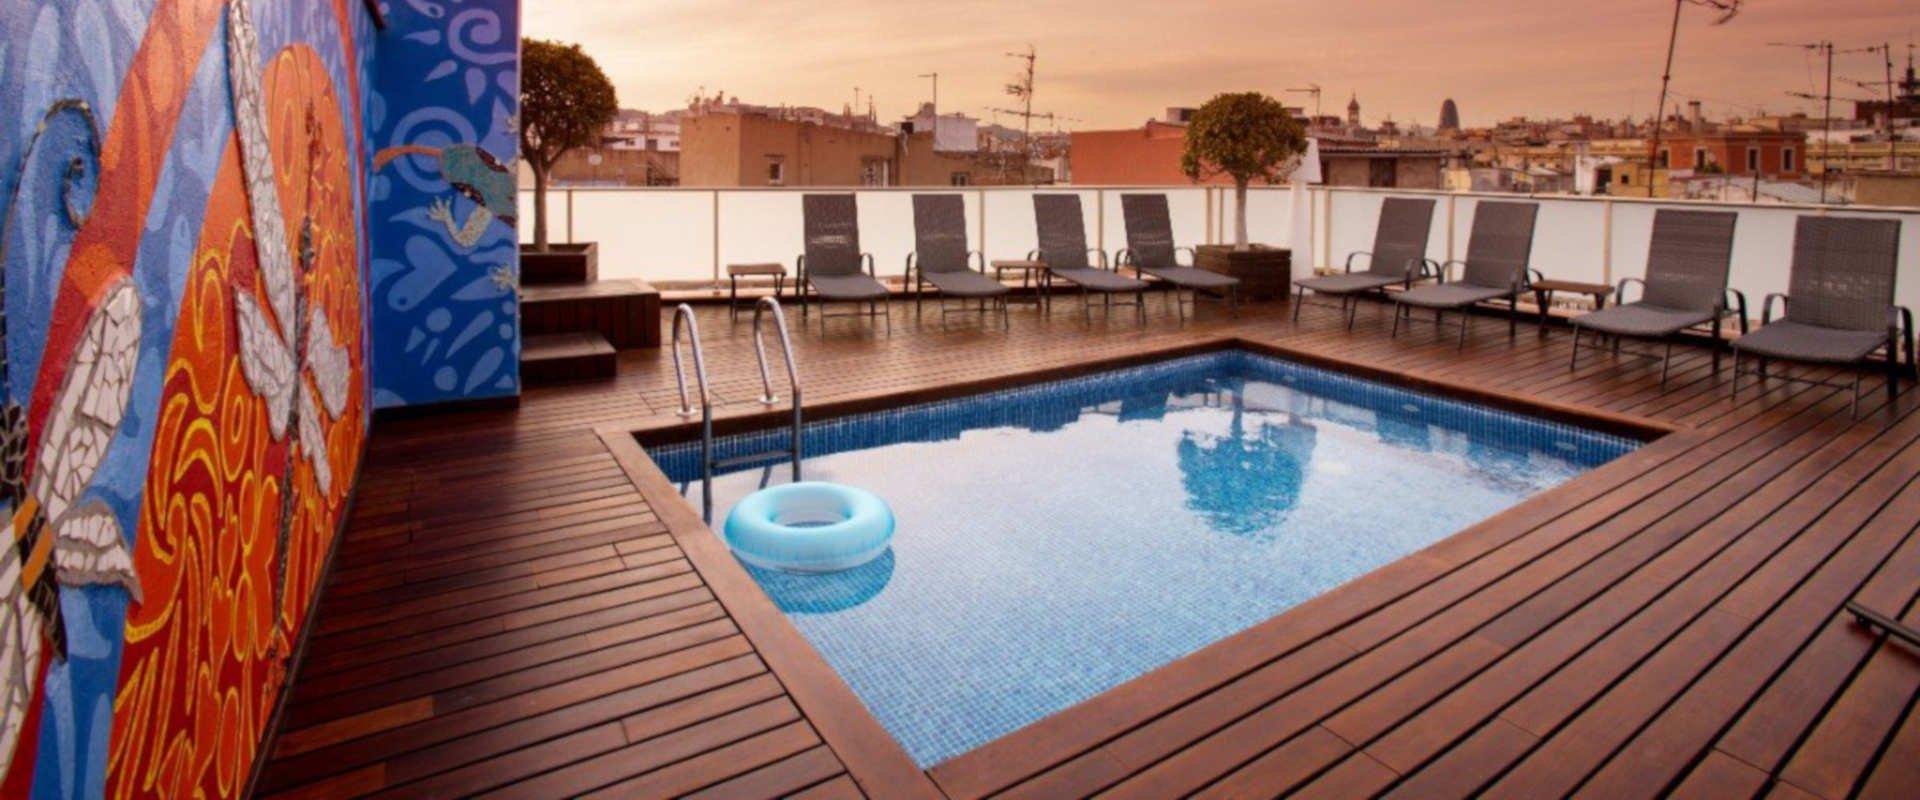 Hotel Ciutat Barcelona a Barcelona Web Oficial